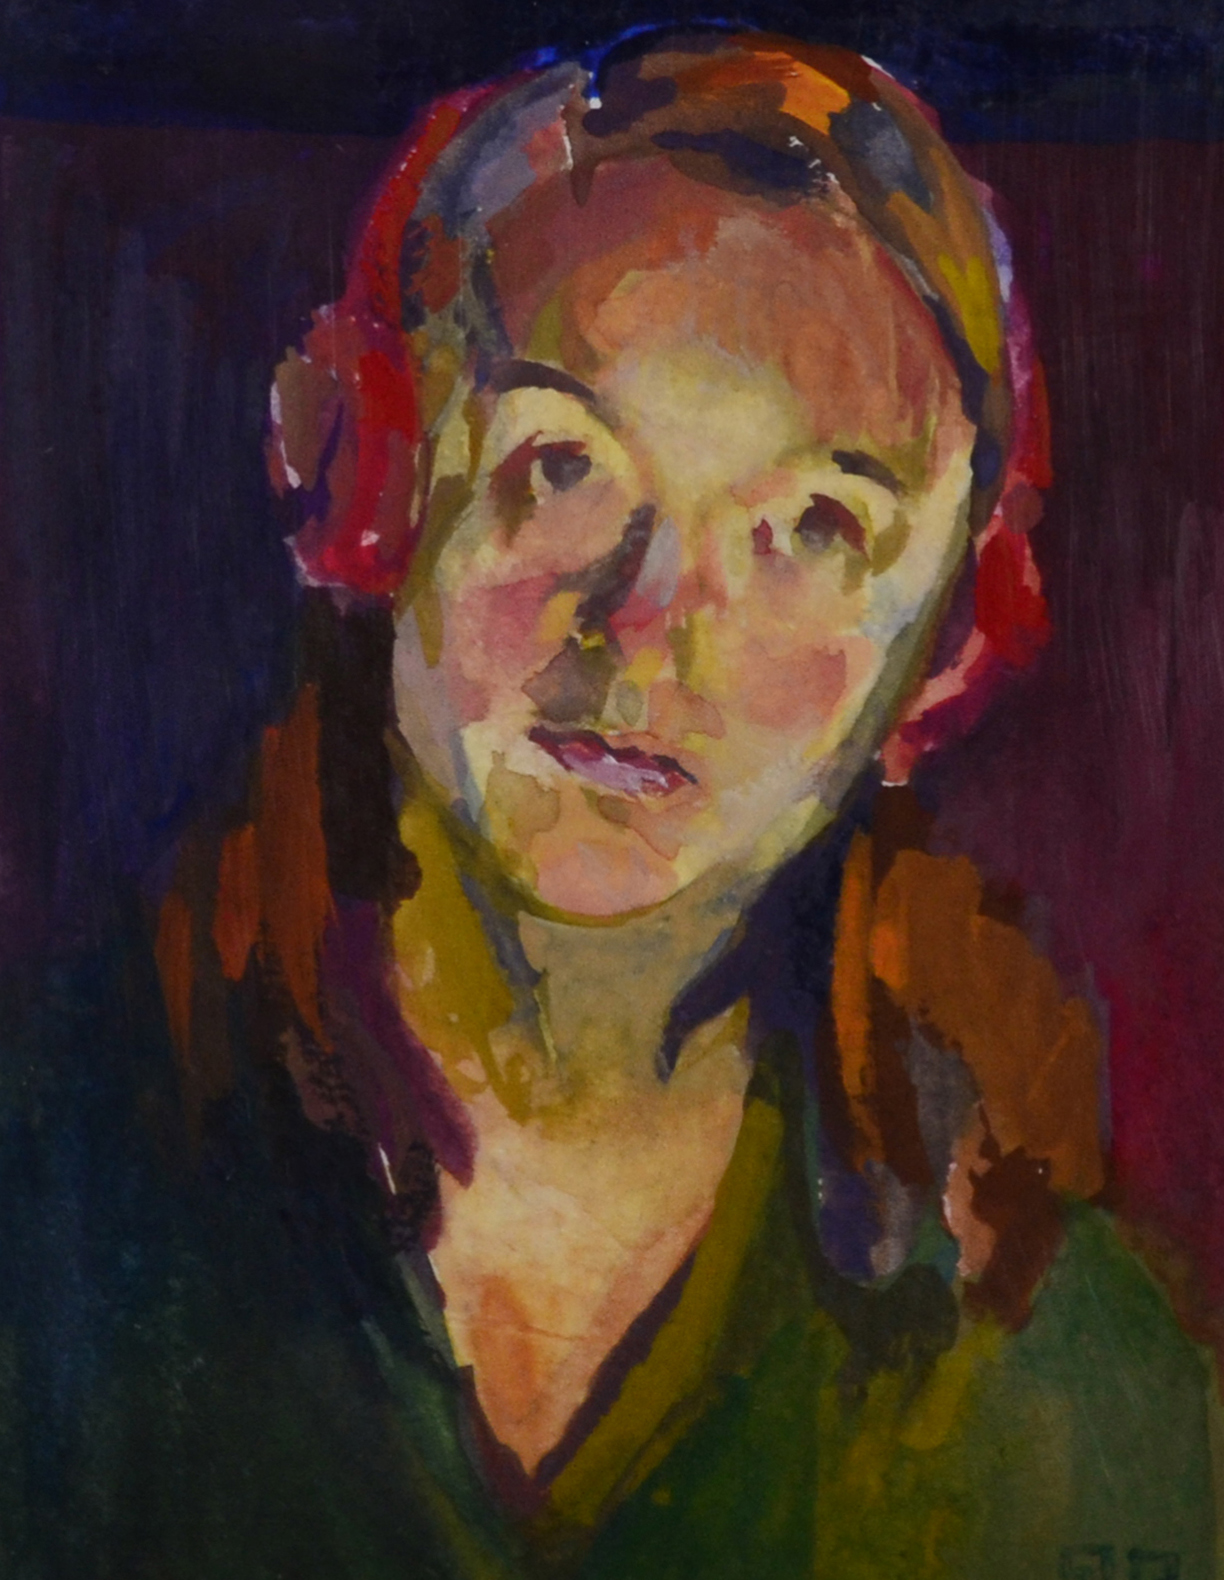 Self-portrait by desk light